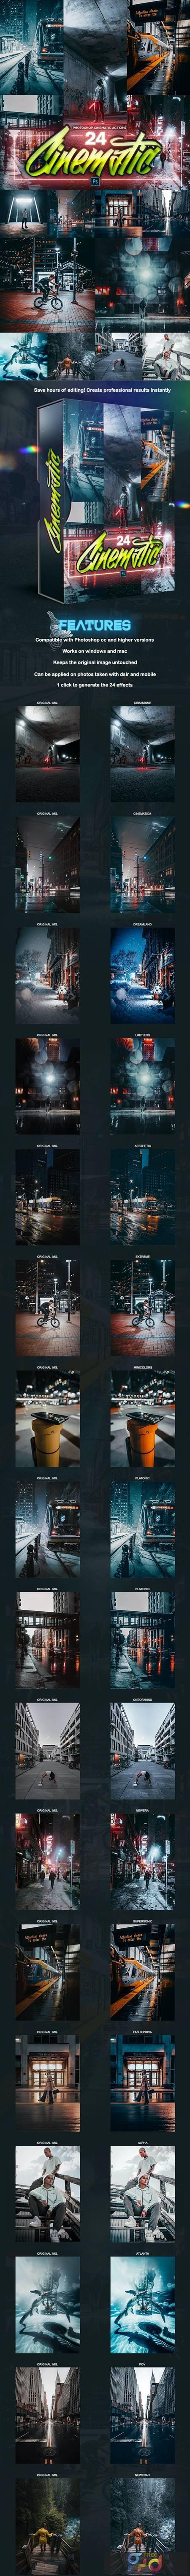 24 Cinematic PRO Photoshop Actions 28734799 1